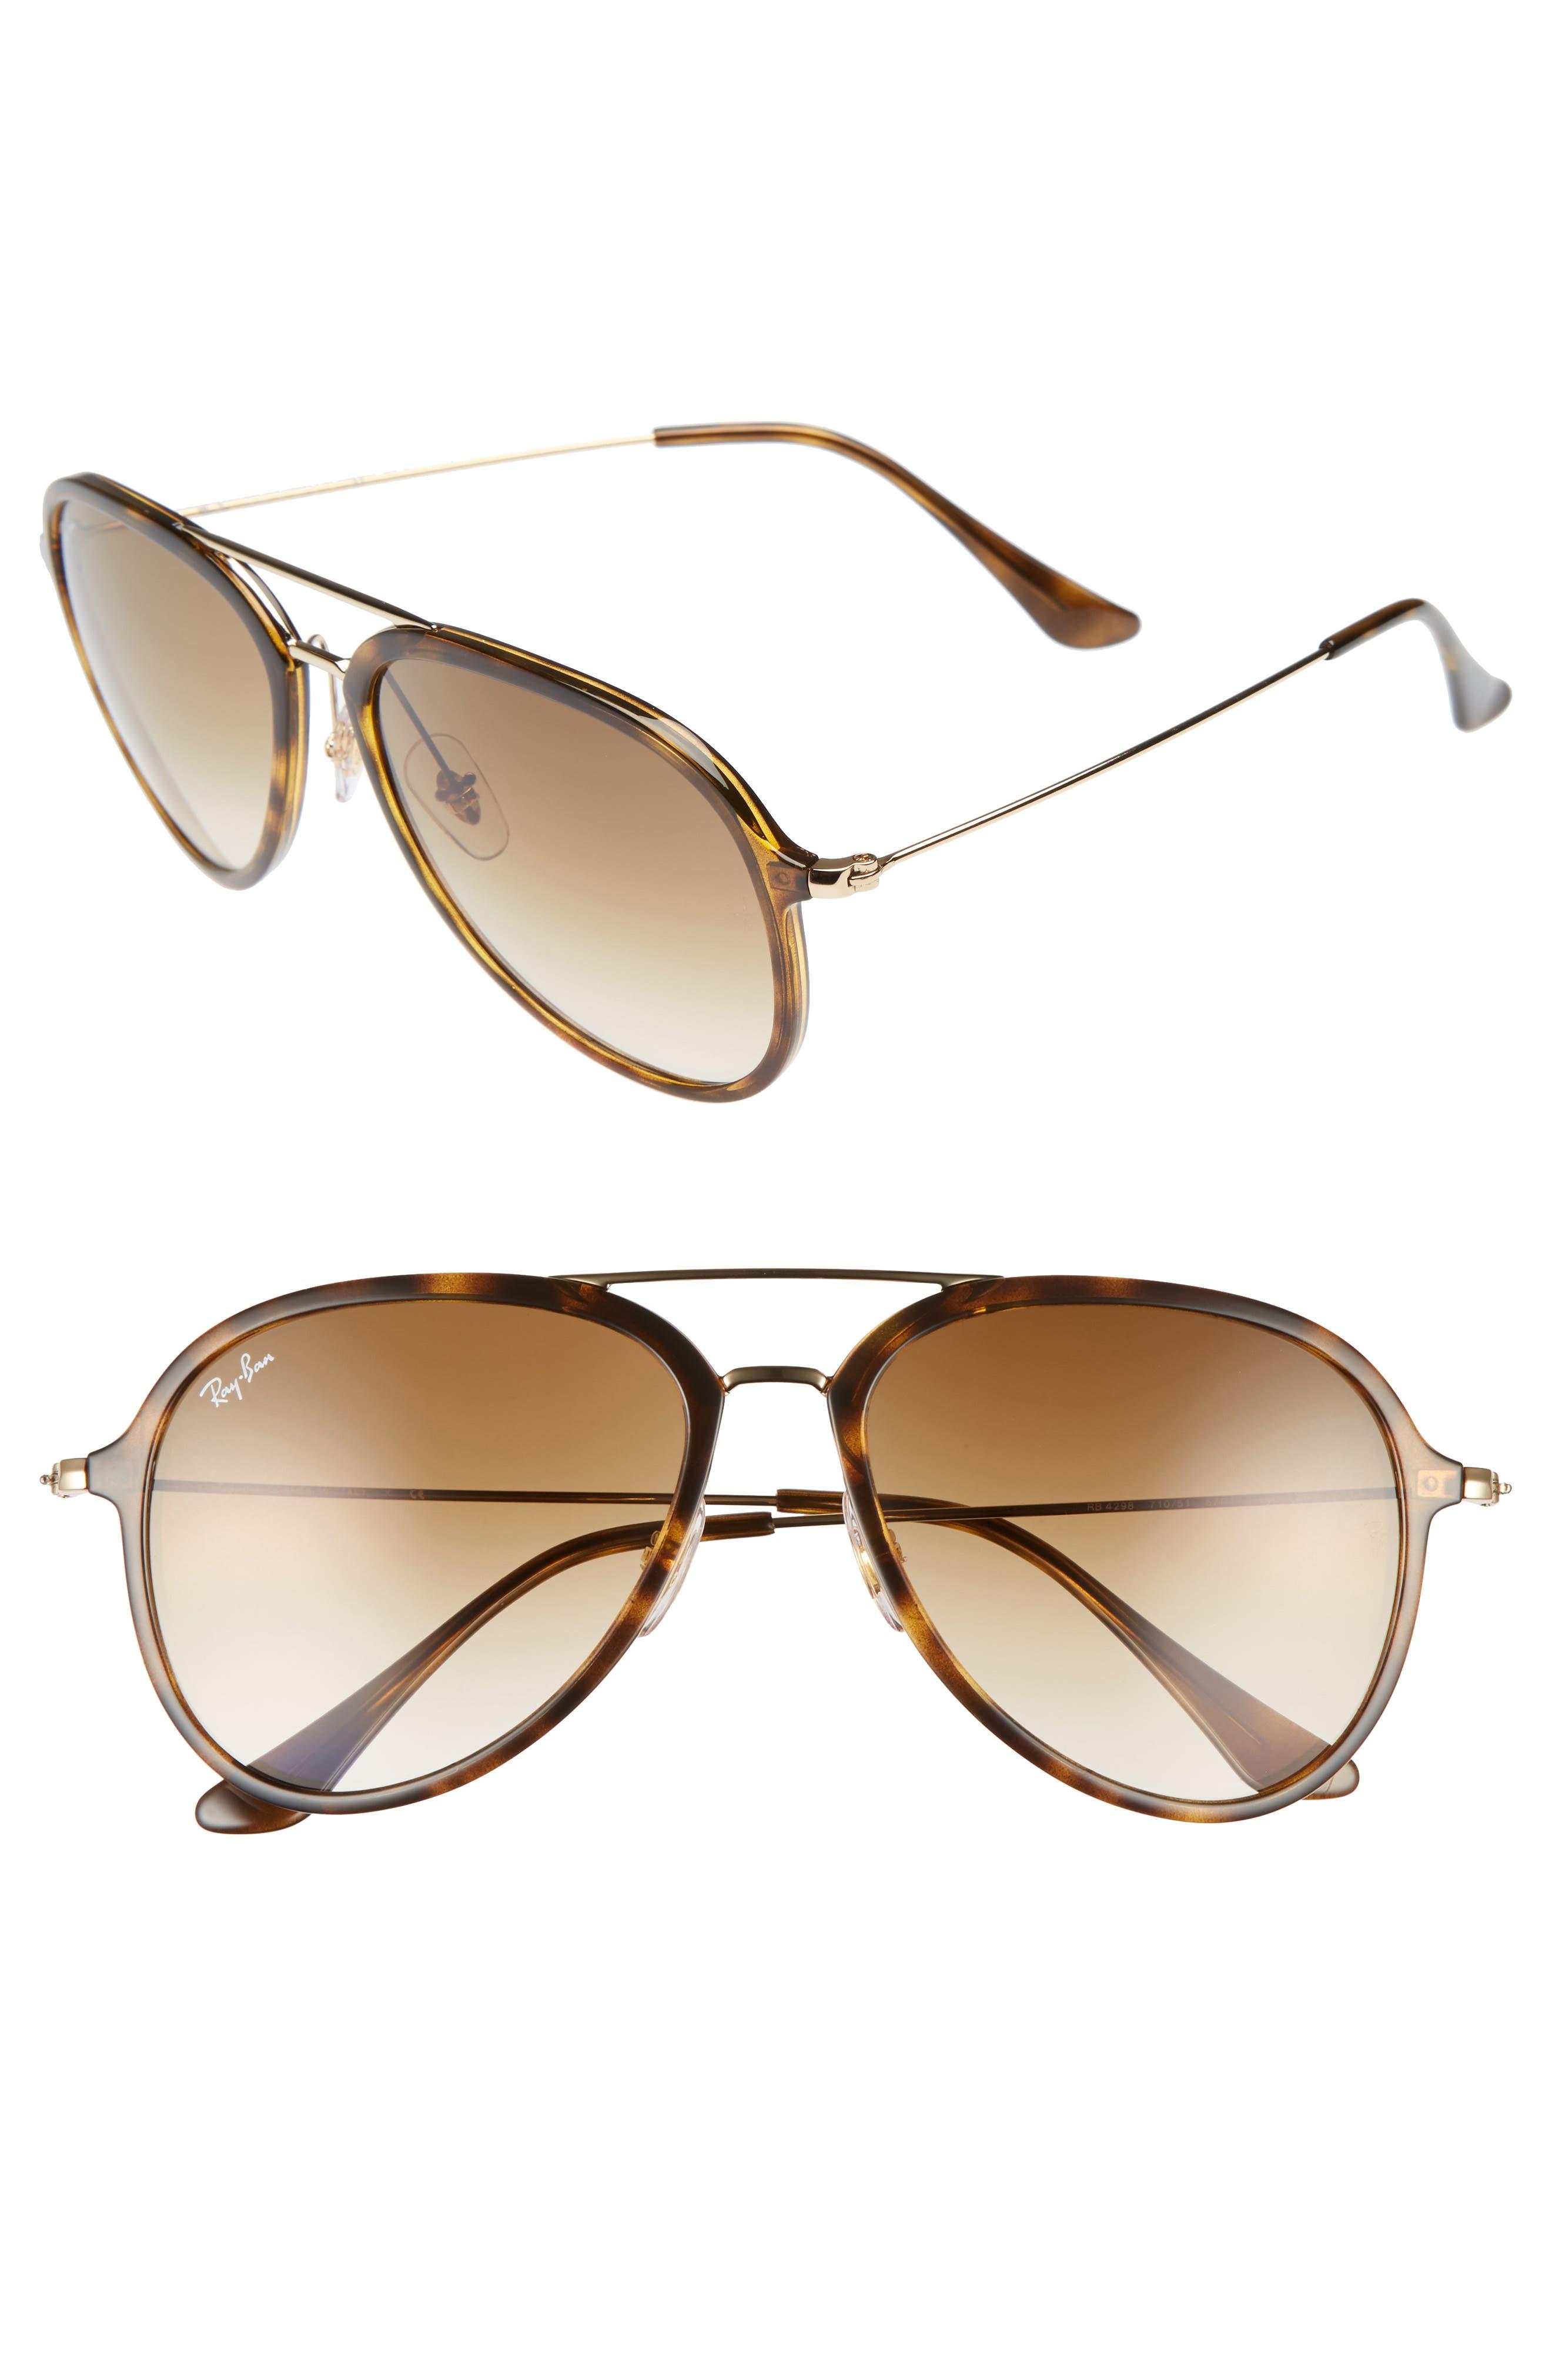 Ray-Ban 57Mm Pilot Sunglasses - Light Havana